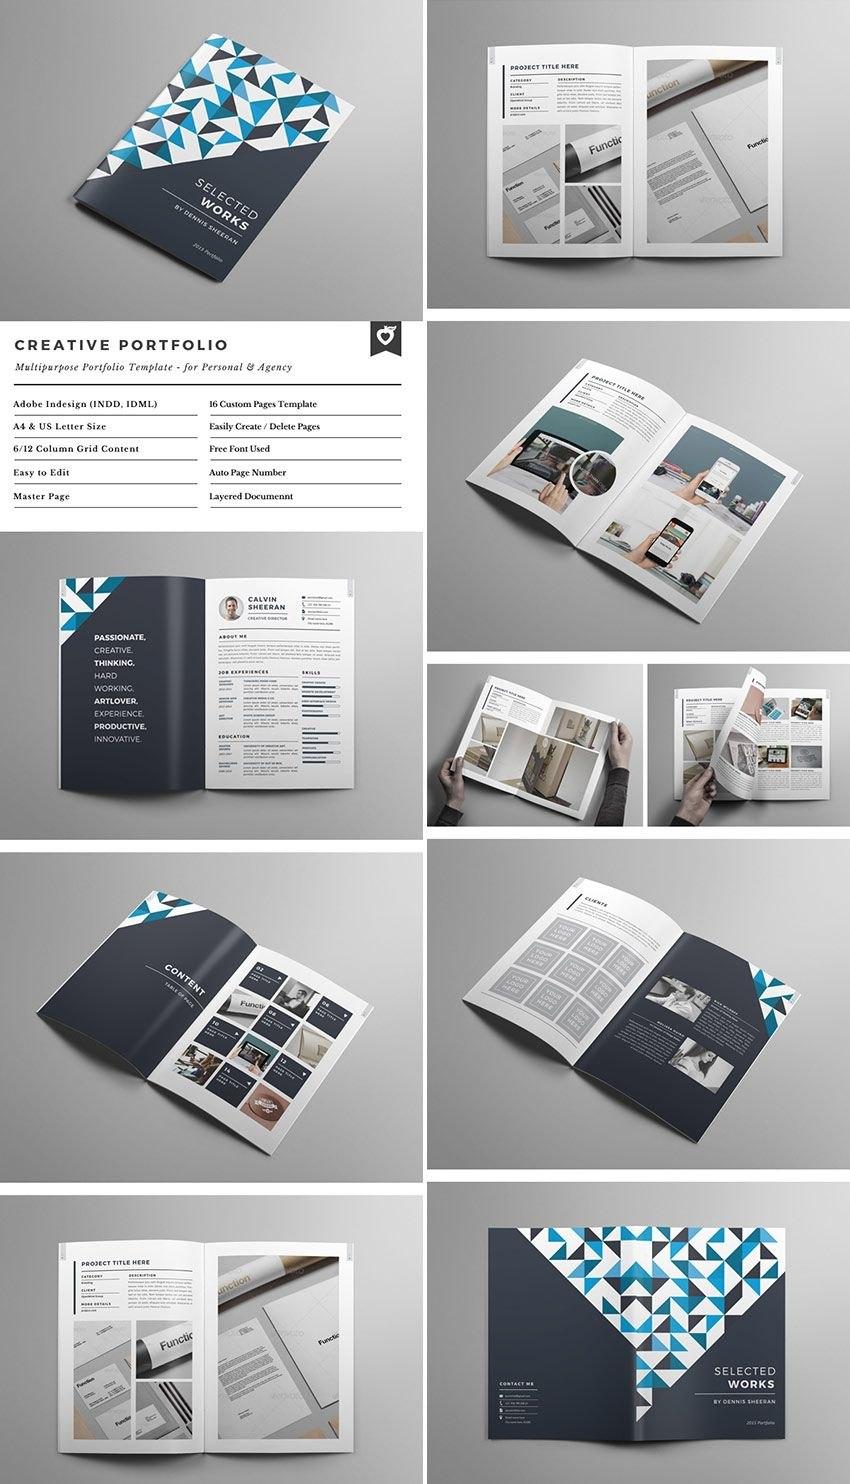 Creative Portfolio Brochure Indd  Resumes And Portfolio  Indesign Within Adobe Indesign Brochure Templates